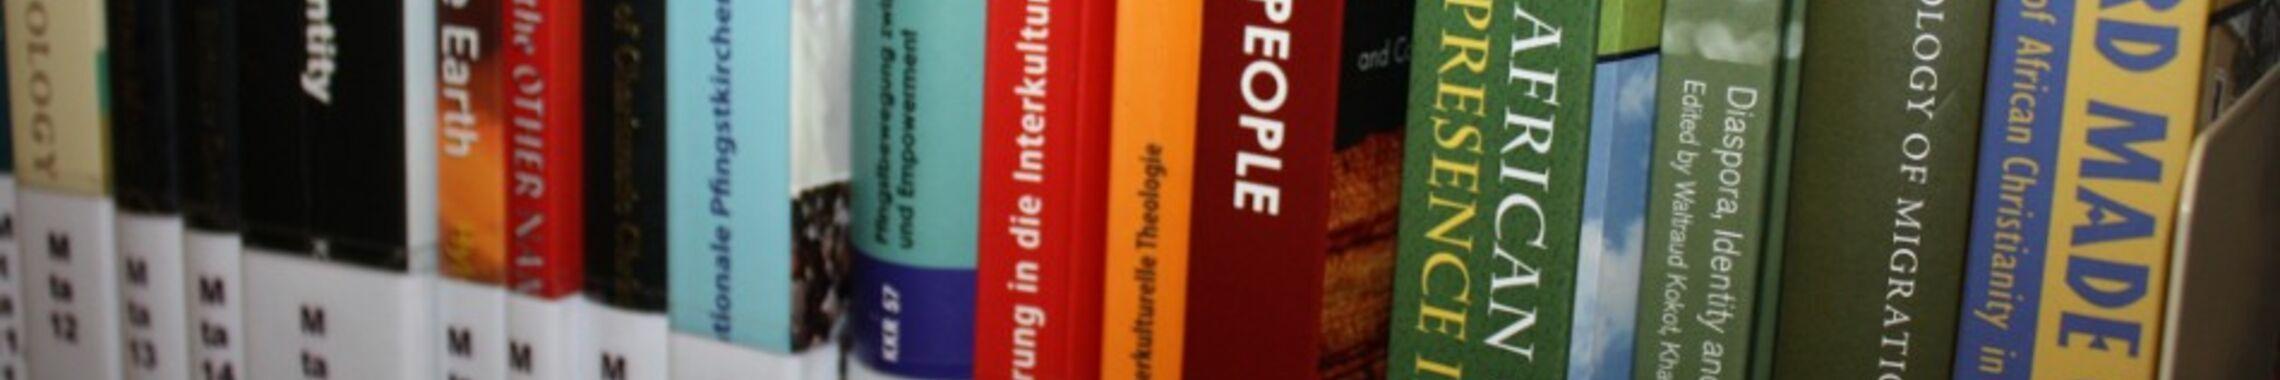 Kopfgrafik Bibliothek